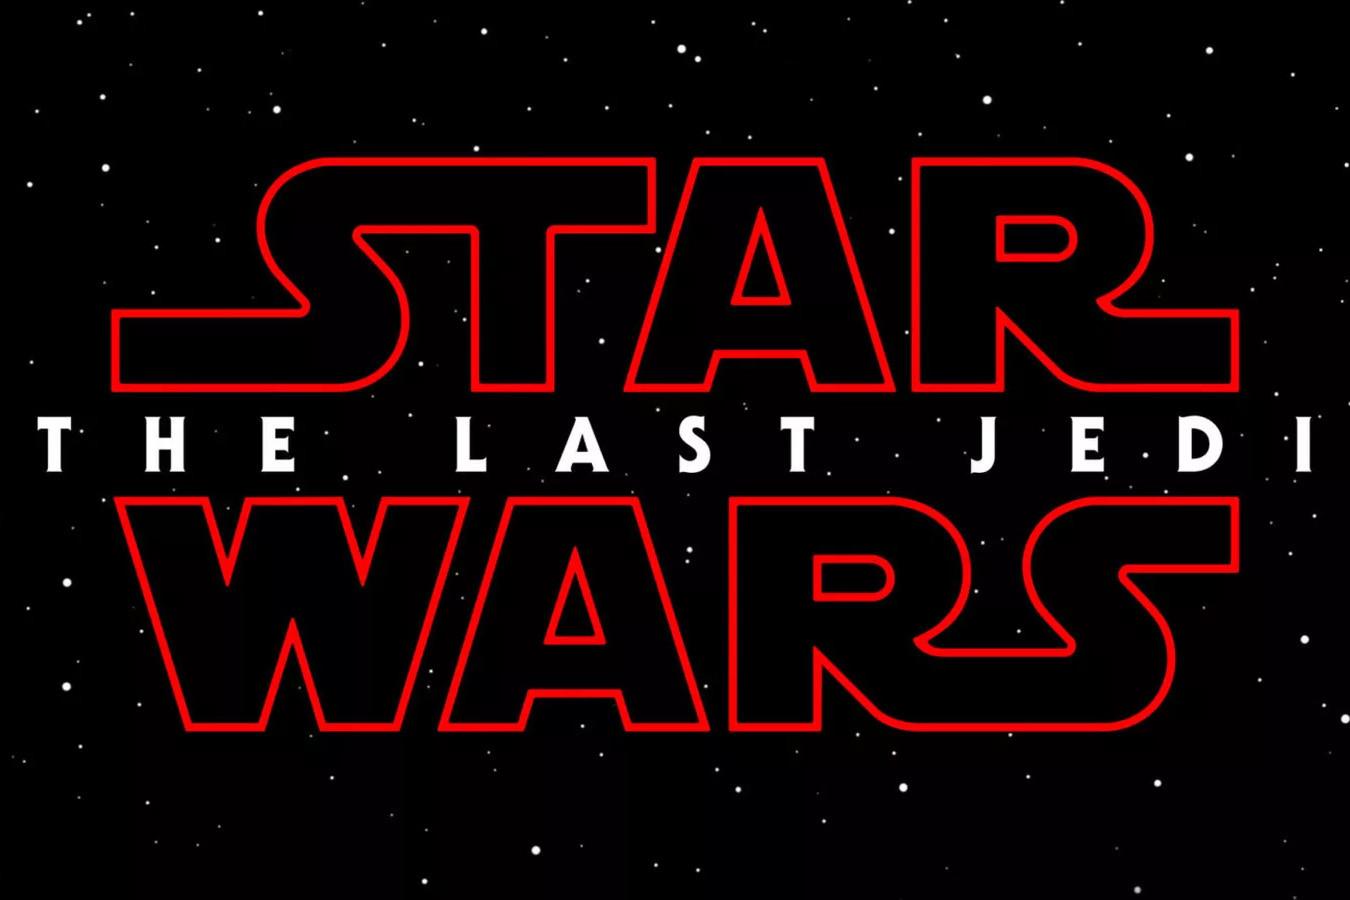 New Galactic Fashion in The Last Jedi